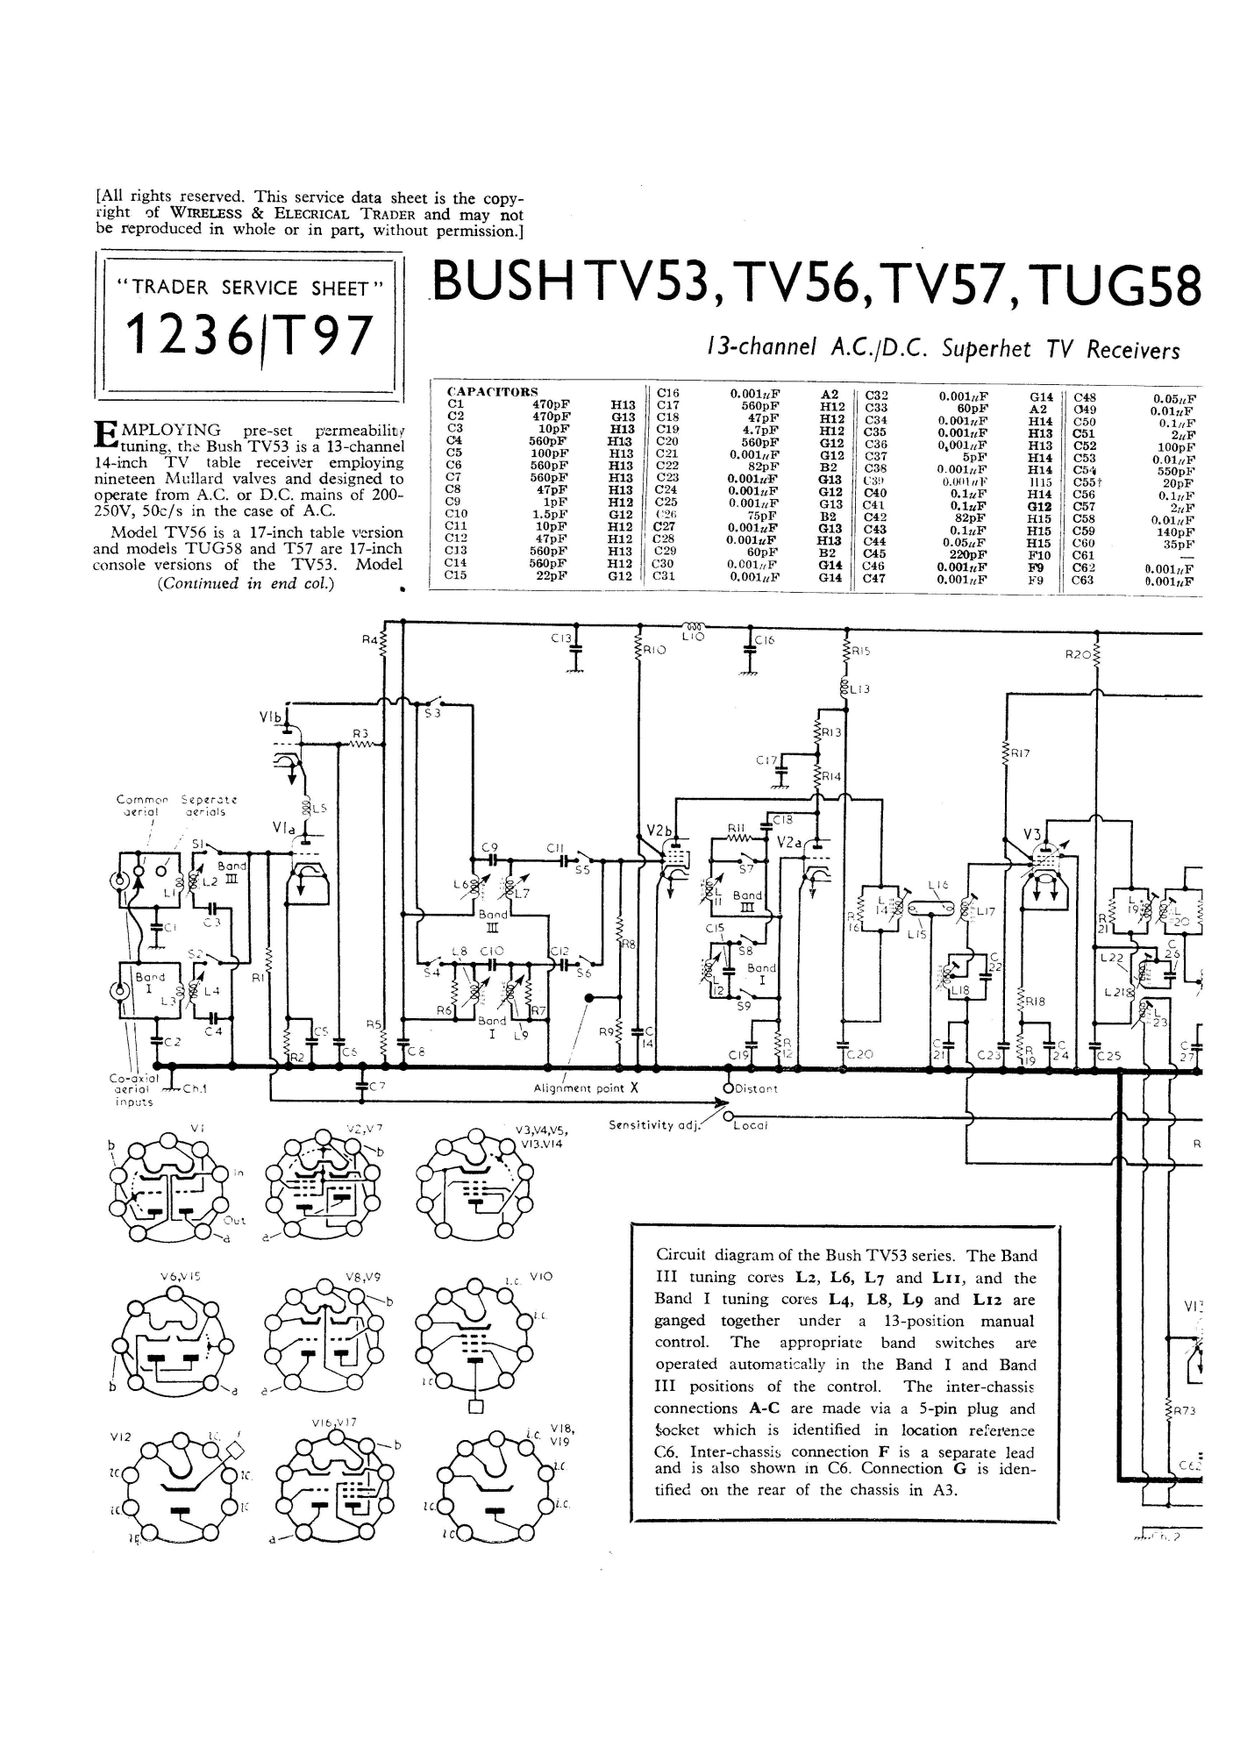 Bush TV62. TV53. TV56. T57. TUG58. TUG59. M59. TV57 Se